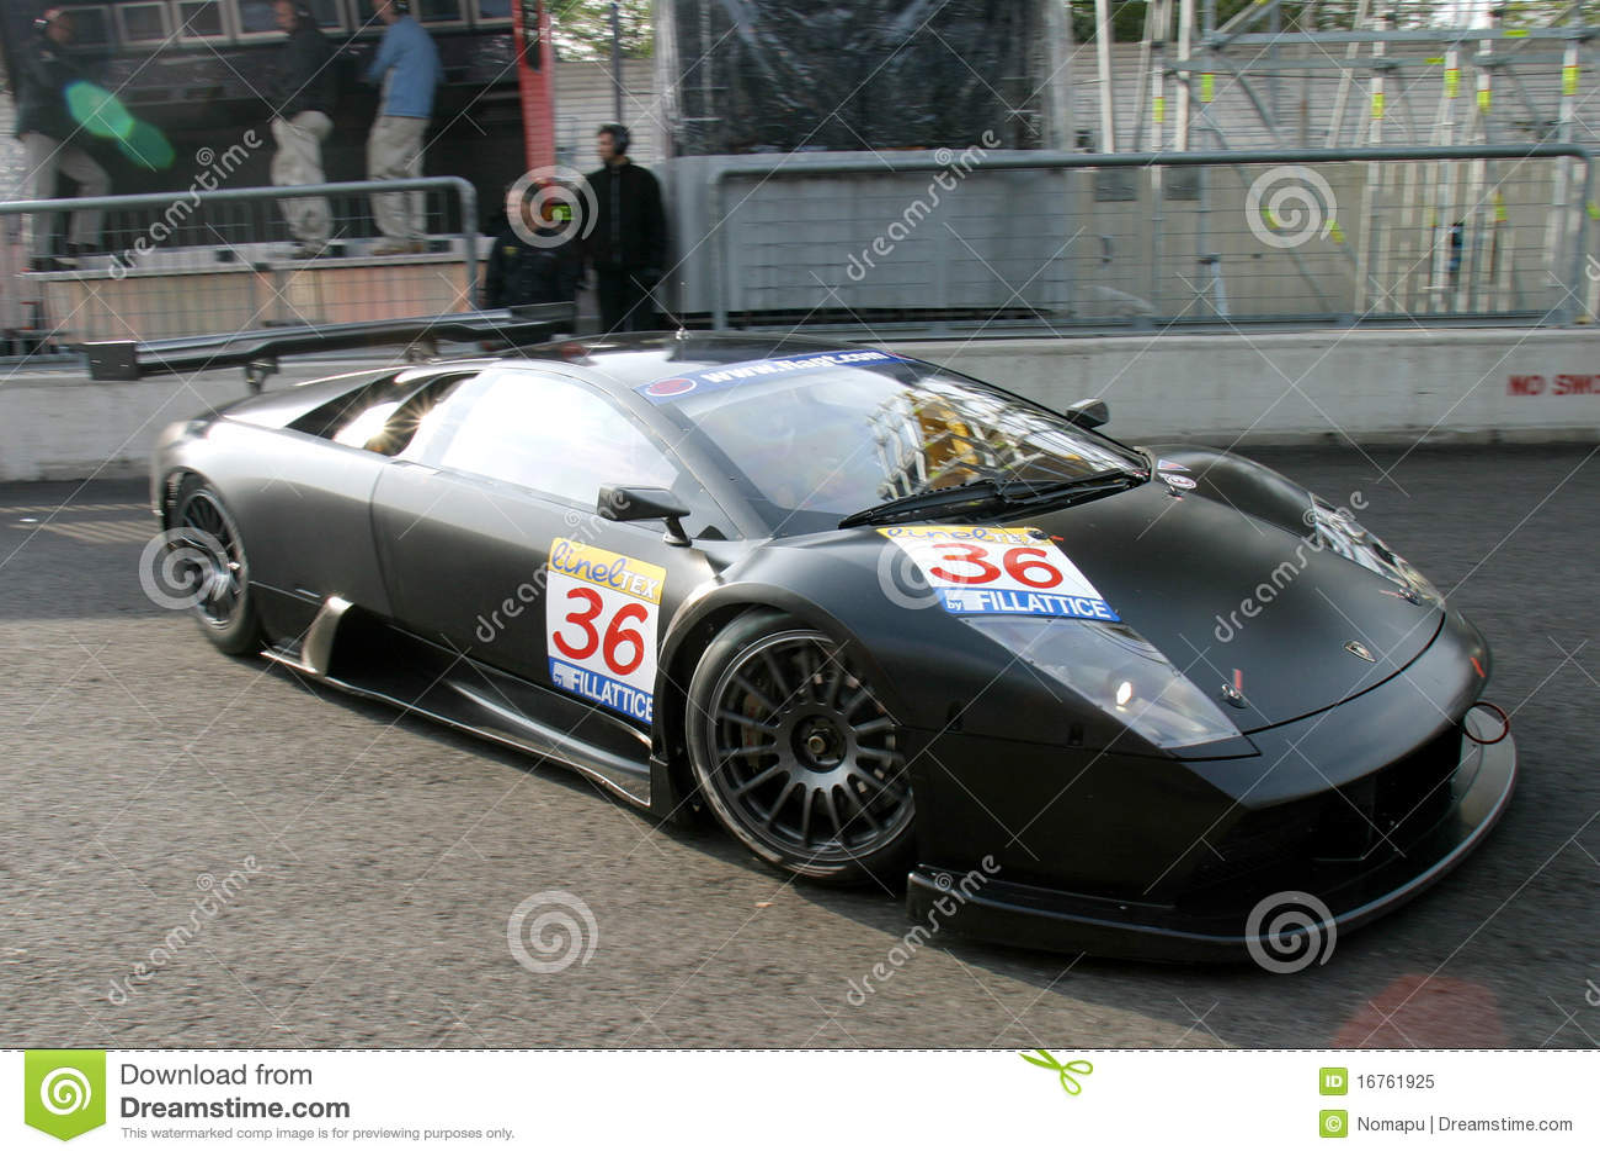 voiture de sport lamborghini murcielago gt image ditorial image du vitesse circuit 16761925. Black Bedroom Furniture Sets. Home Design Ideas